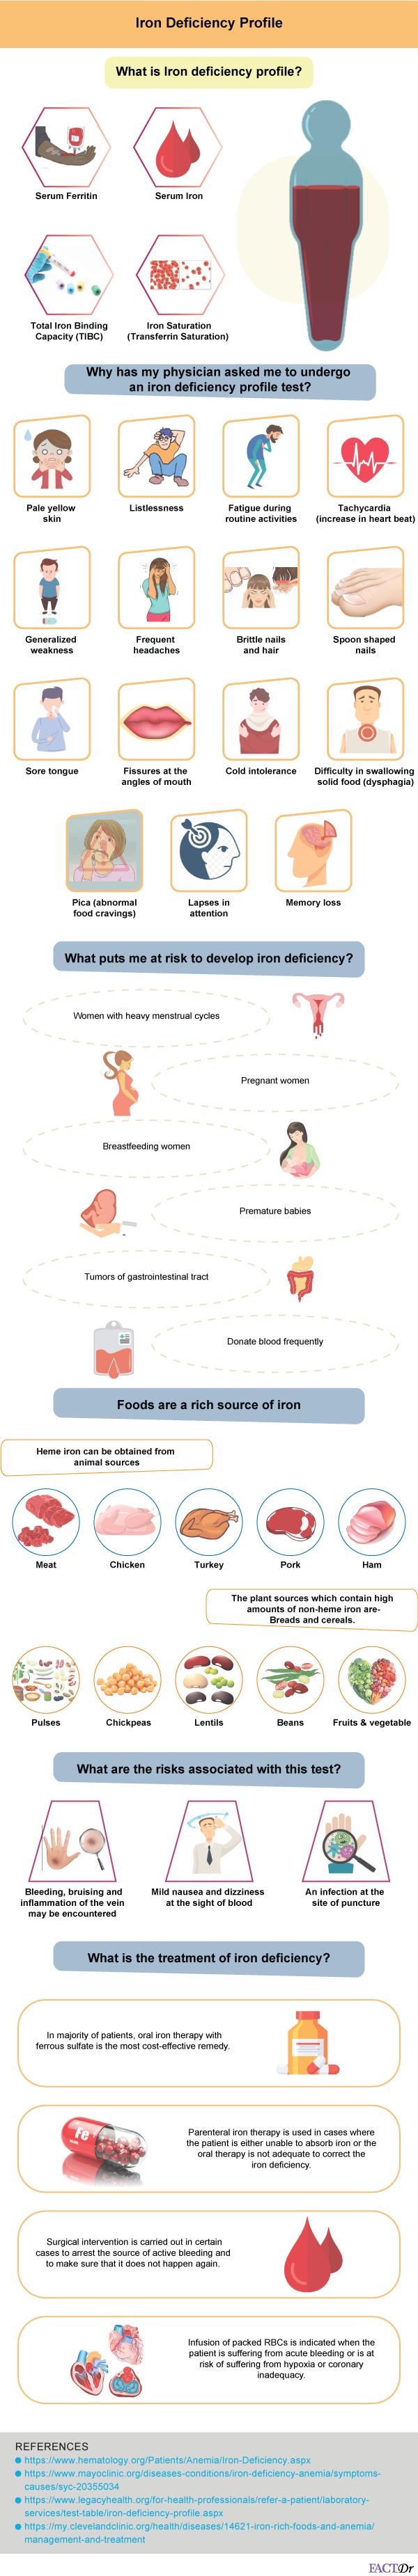 iron deficiency profile